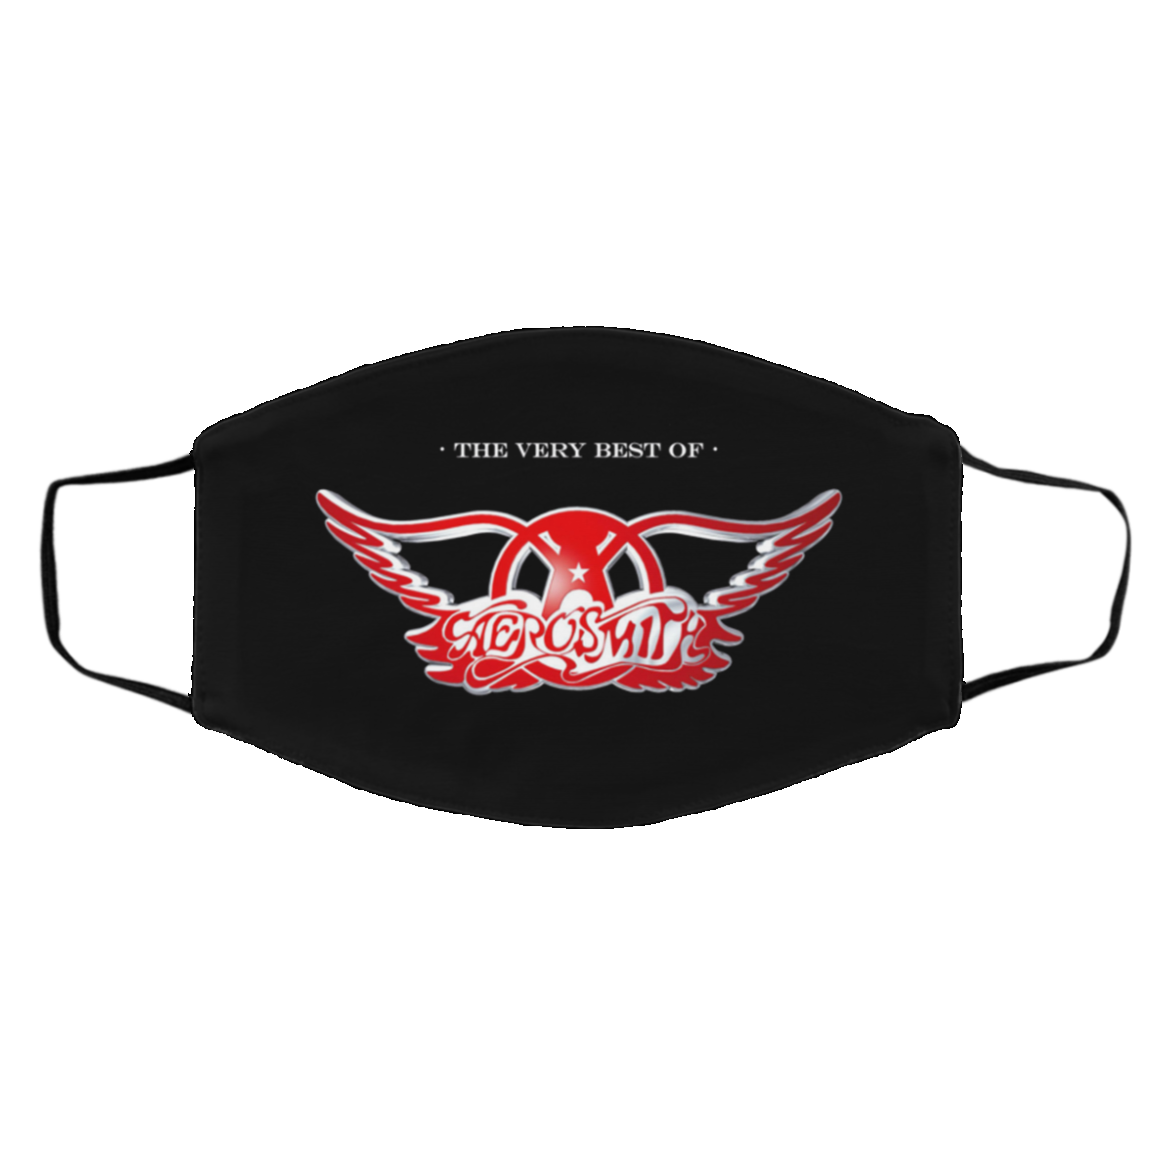 Aerosmith Face Mask Filter US 2020